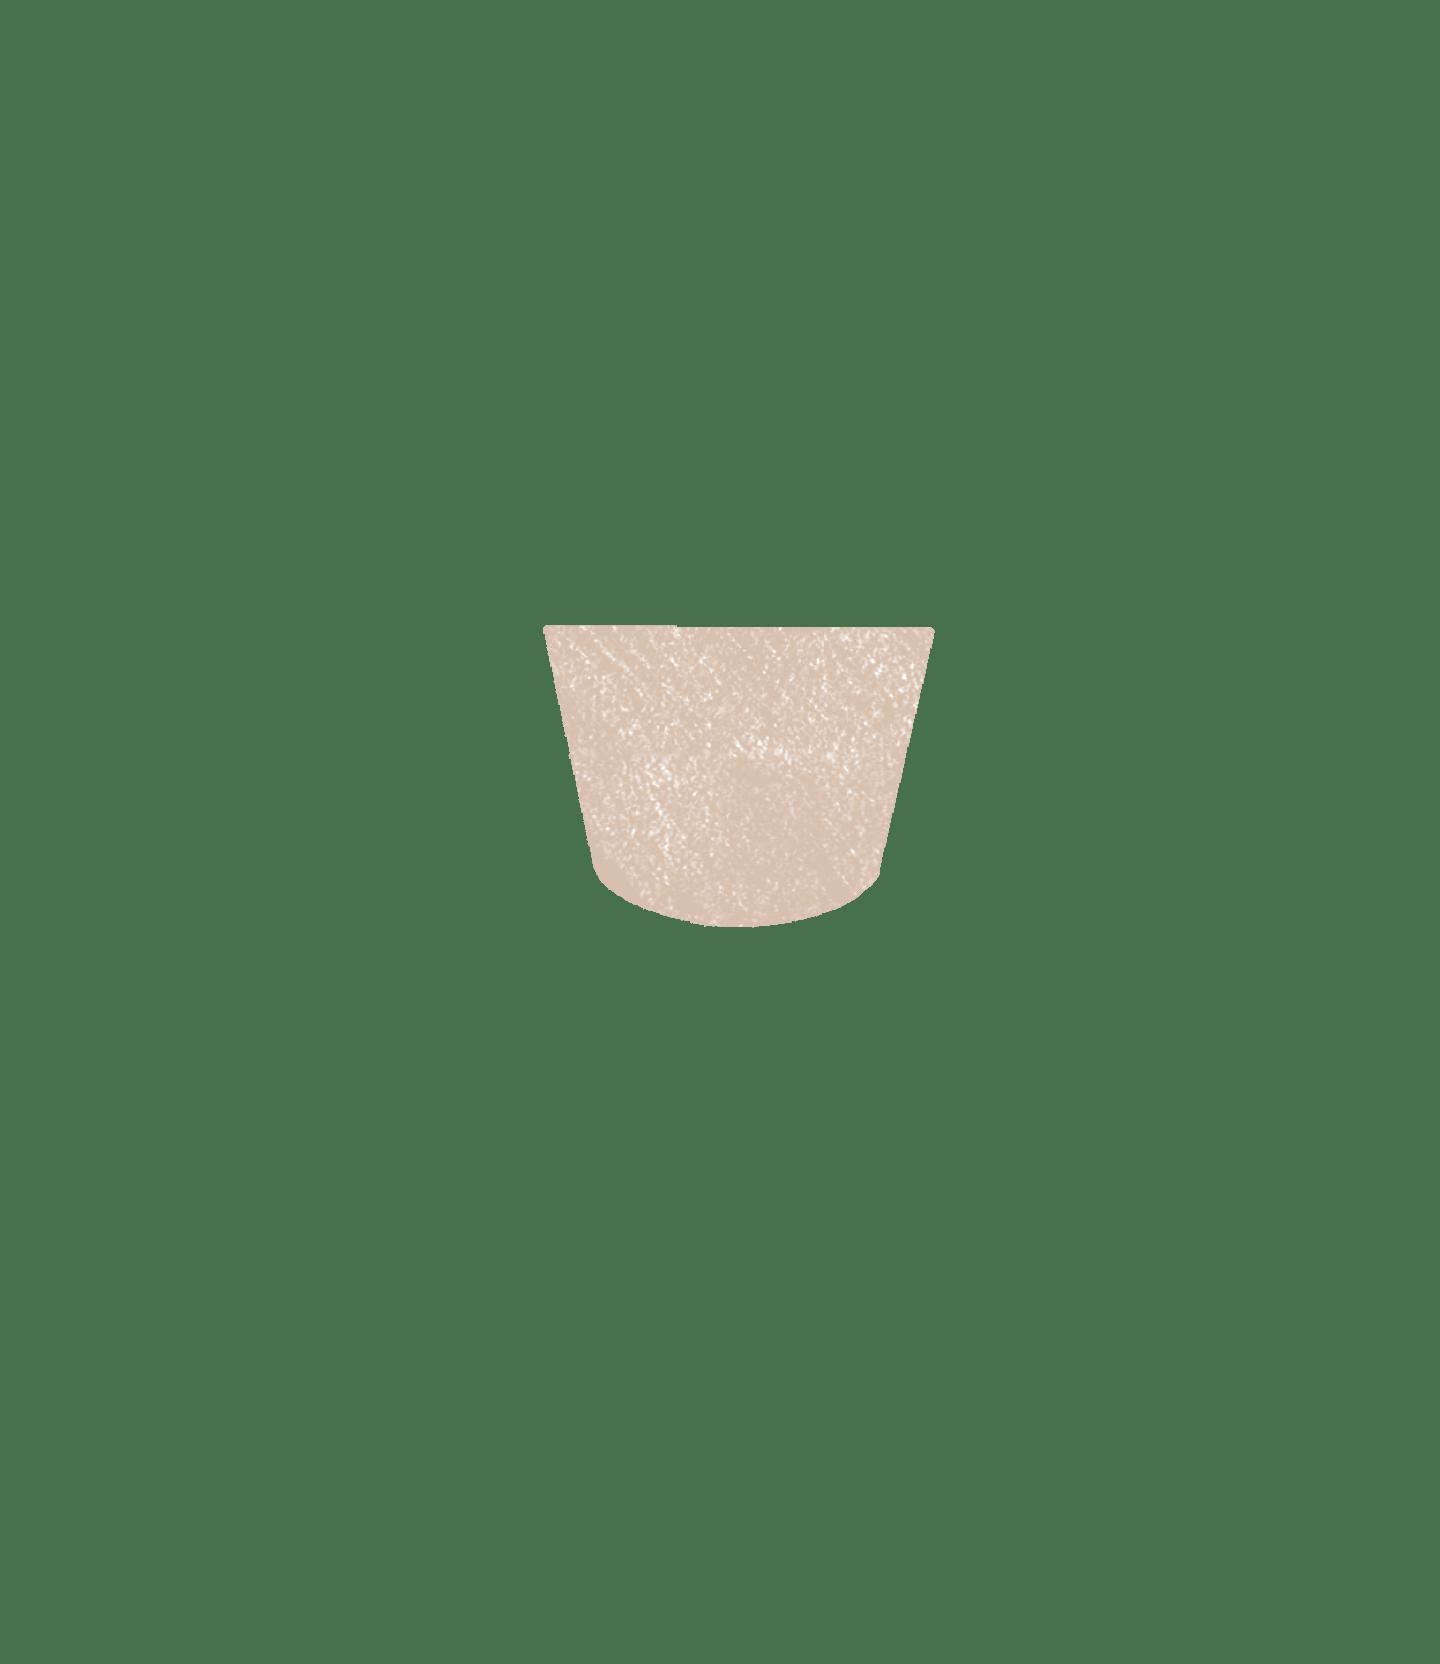 monstera adansonii pot